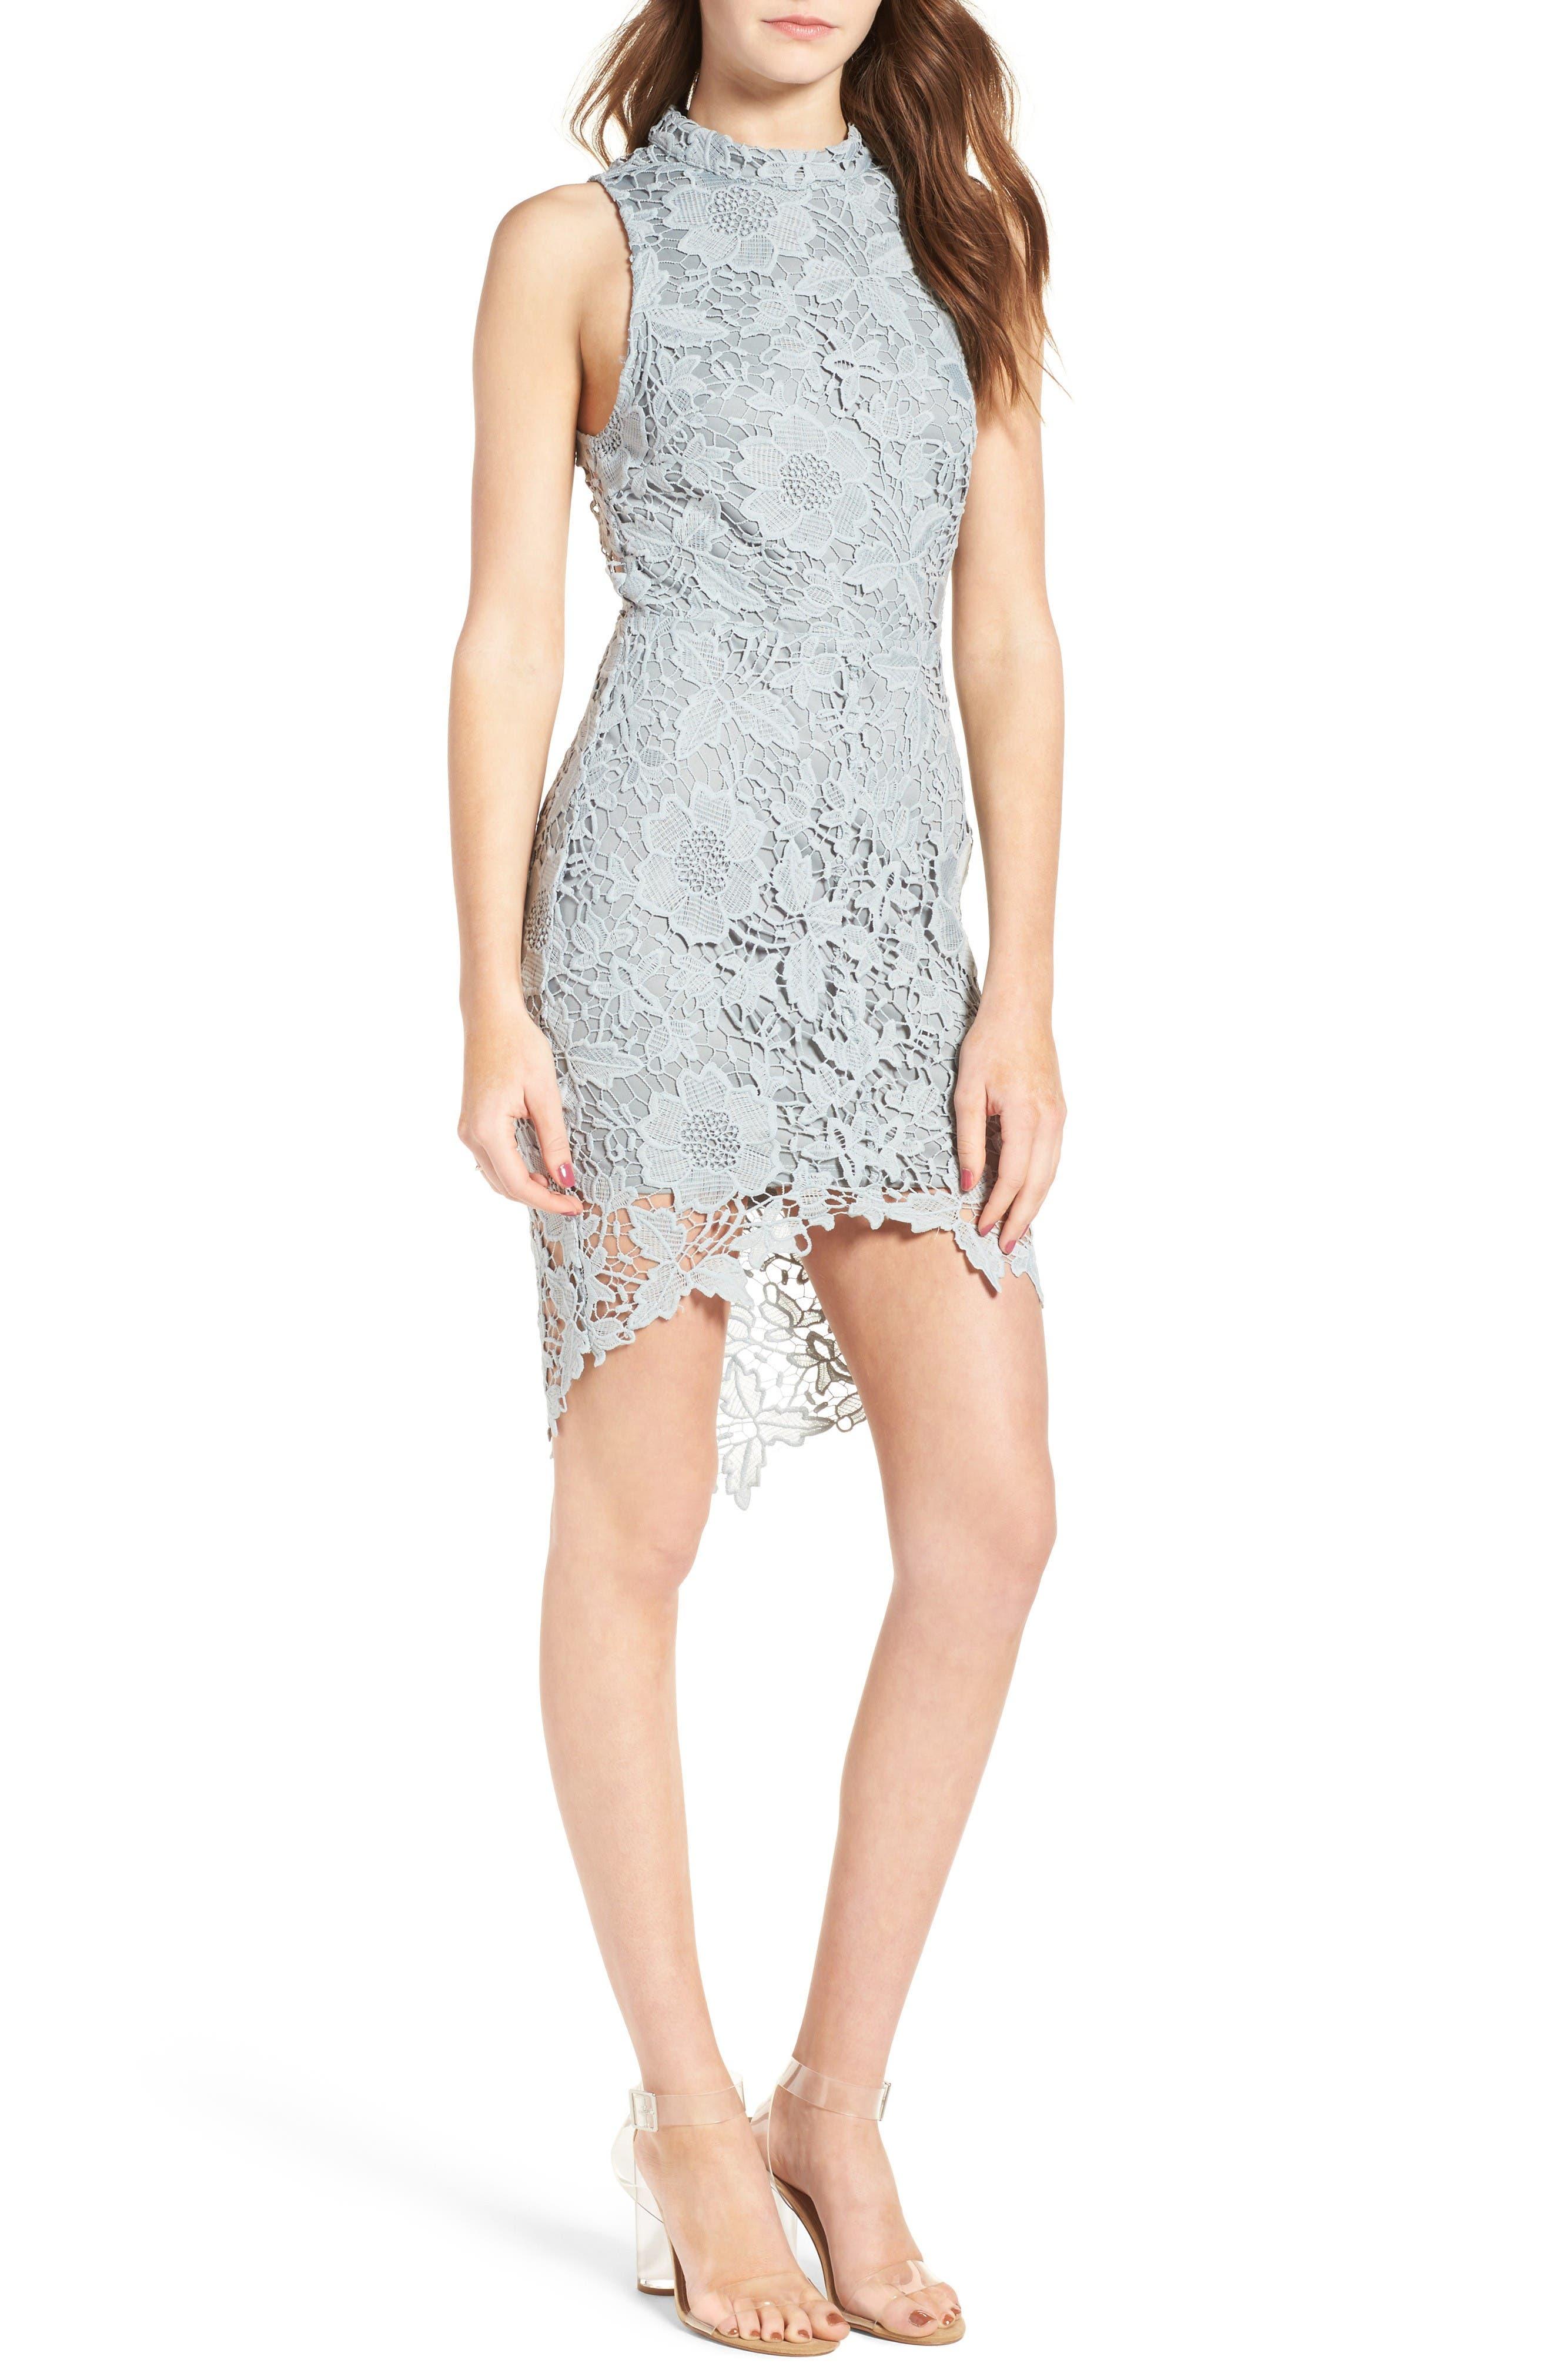 Alternate Image 1 Selected - ASTR the Label 'Samantha' Lace Dress